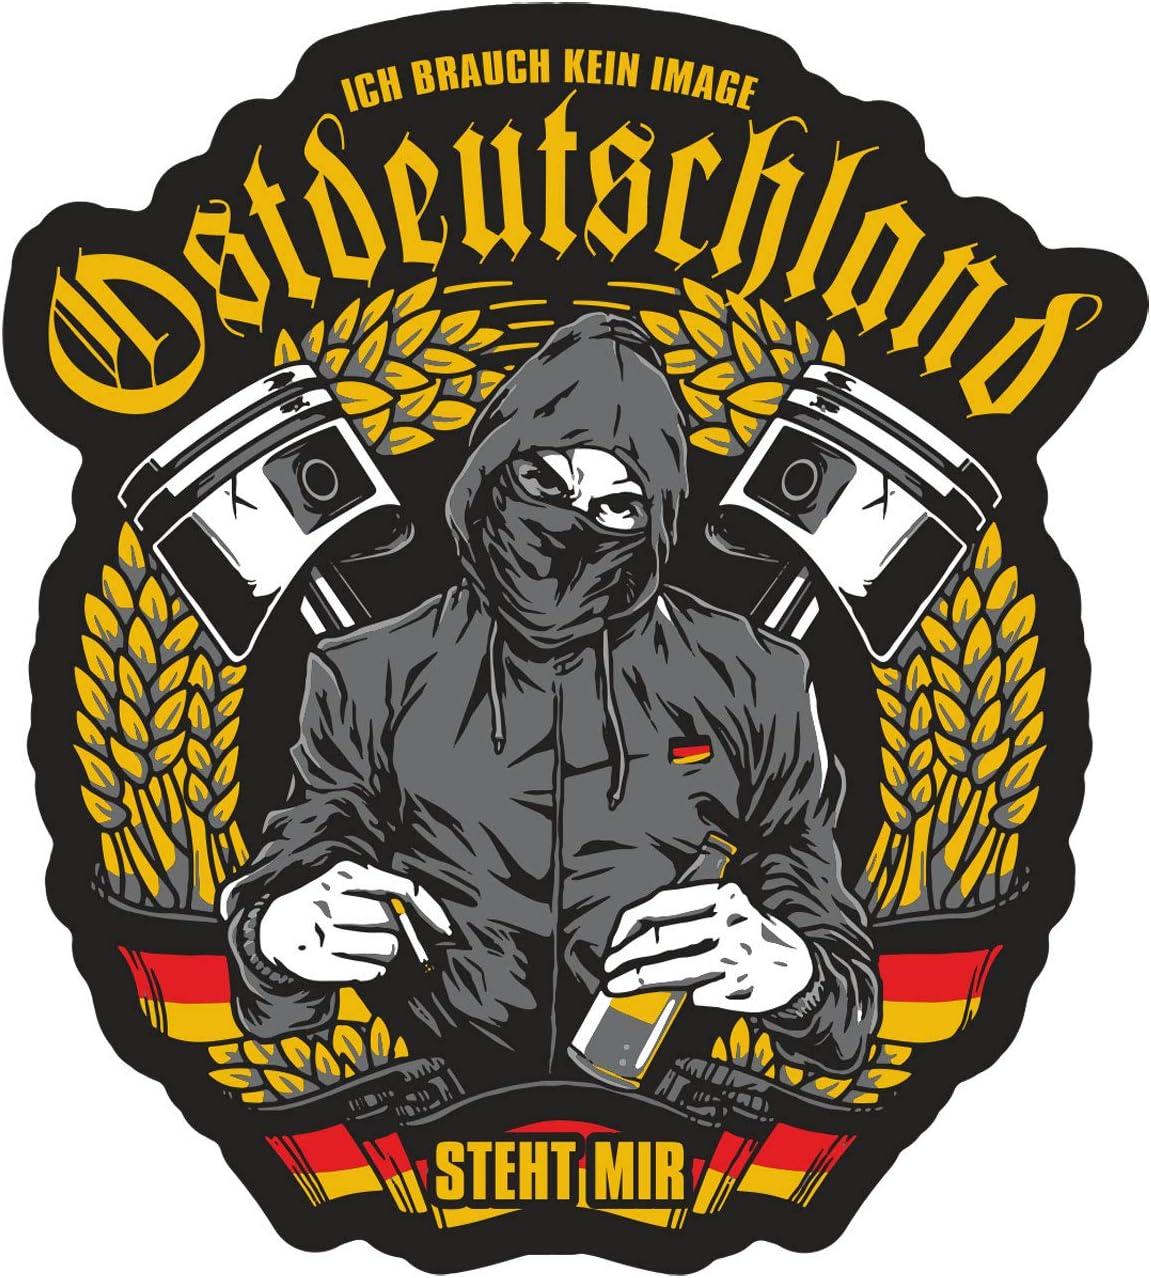 Aufkleber Wetterfest Ostdeutschland Steht Mir 11 Cm Oder 40 Cm Osten Ddr Moped Auto